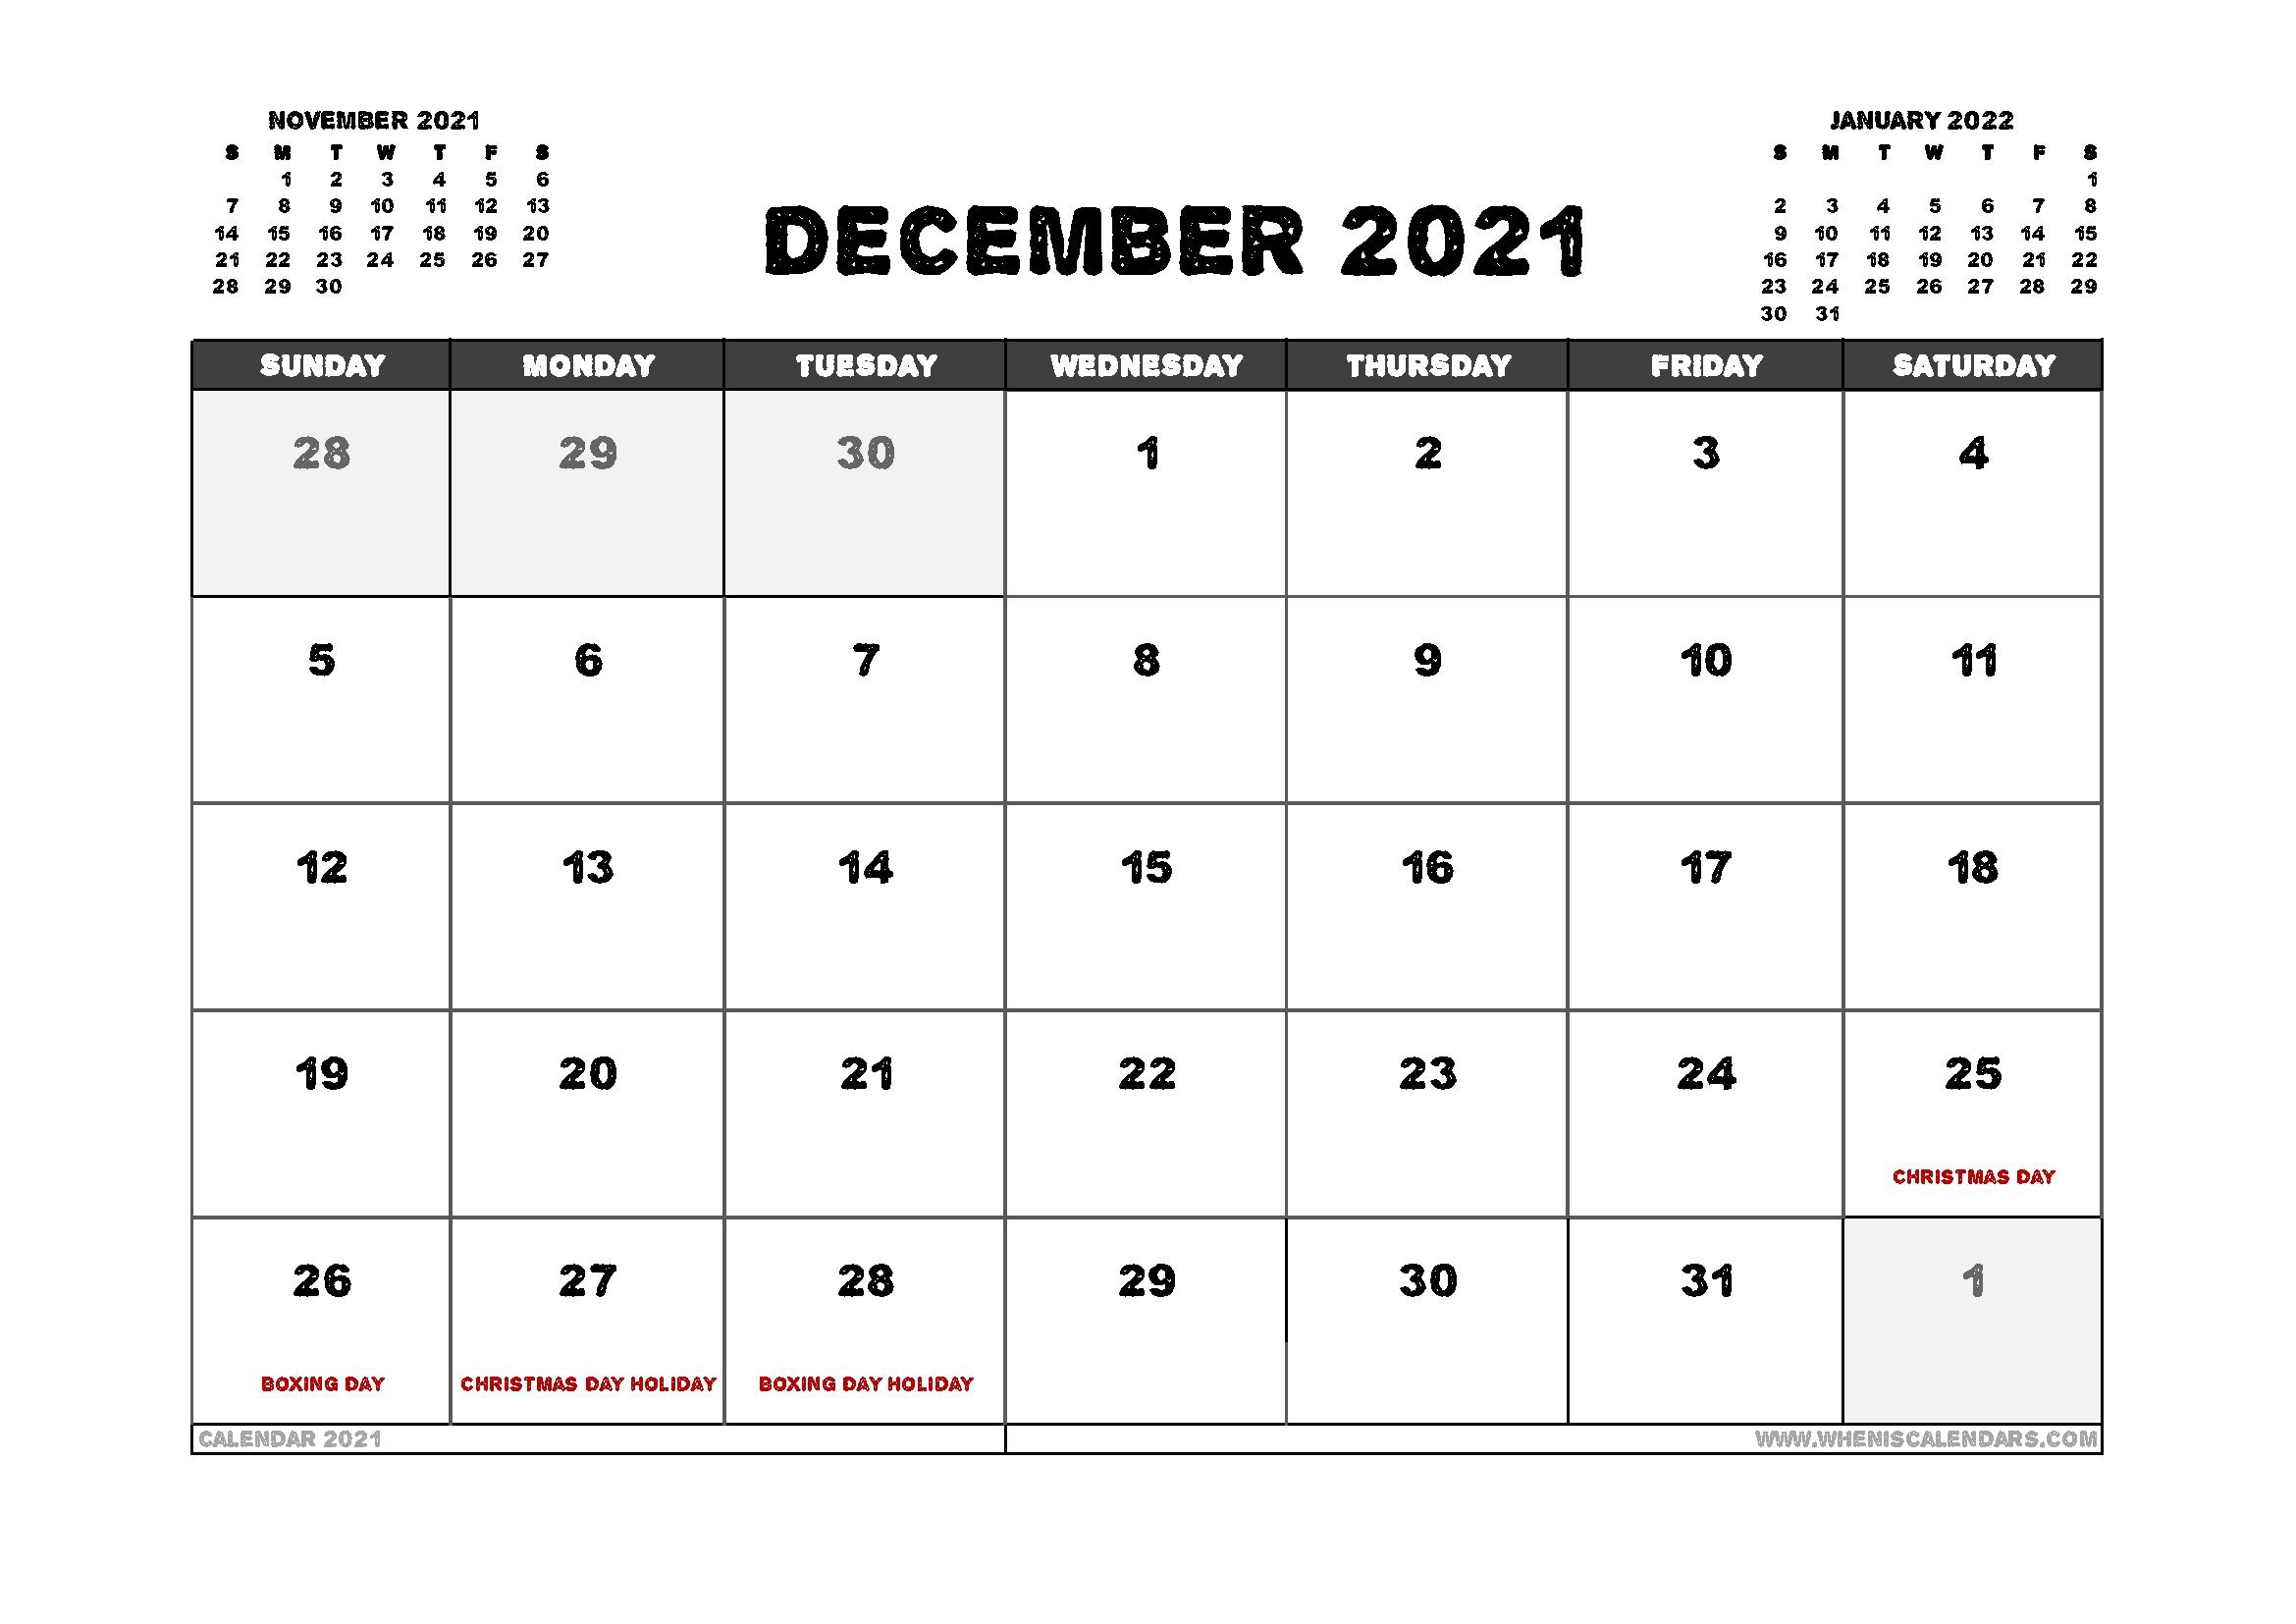 Free December 2021 Calendar Australia Printable 12 Templates - Free 2020 And 2021 Calendar intended for 2021 Australia Calendar With Holidays Photo